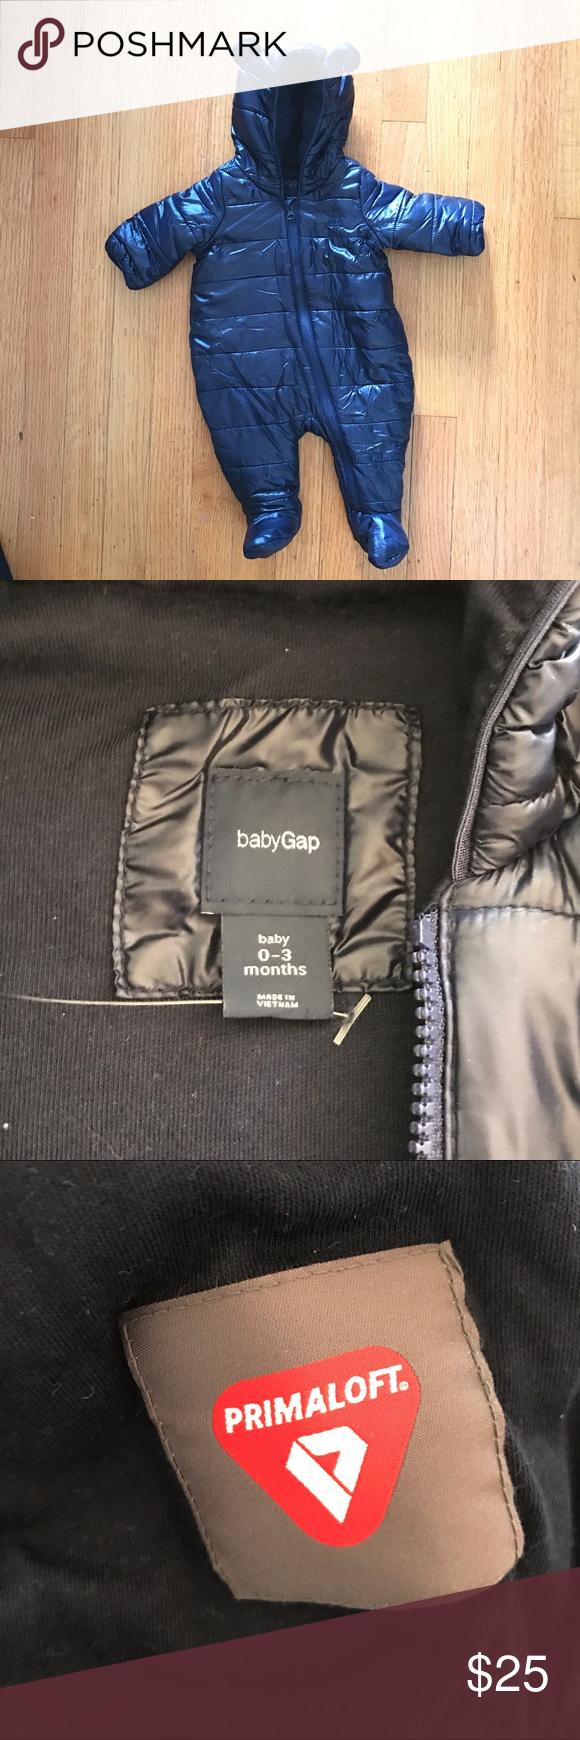 ddd7755e1 Baby Gap Snow Suit w  Primaloft Insulation